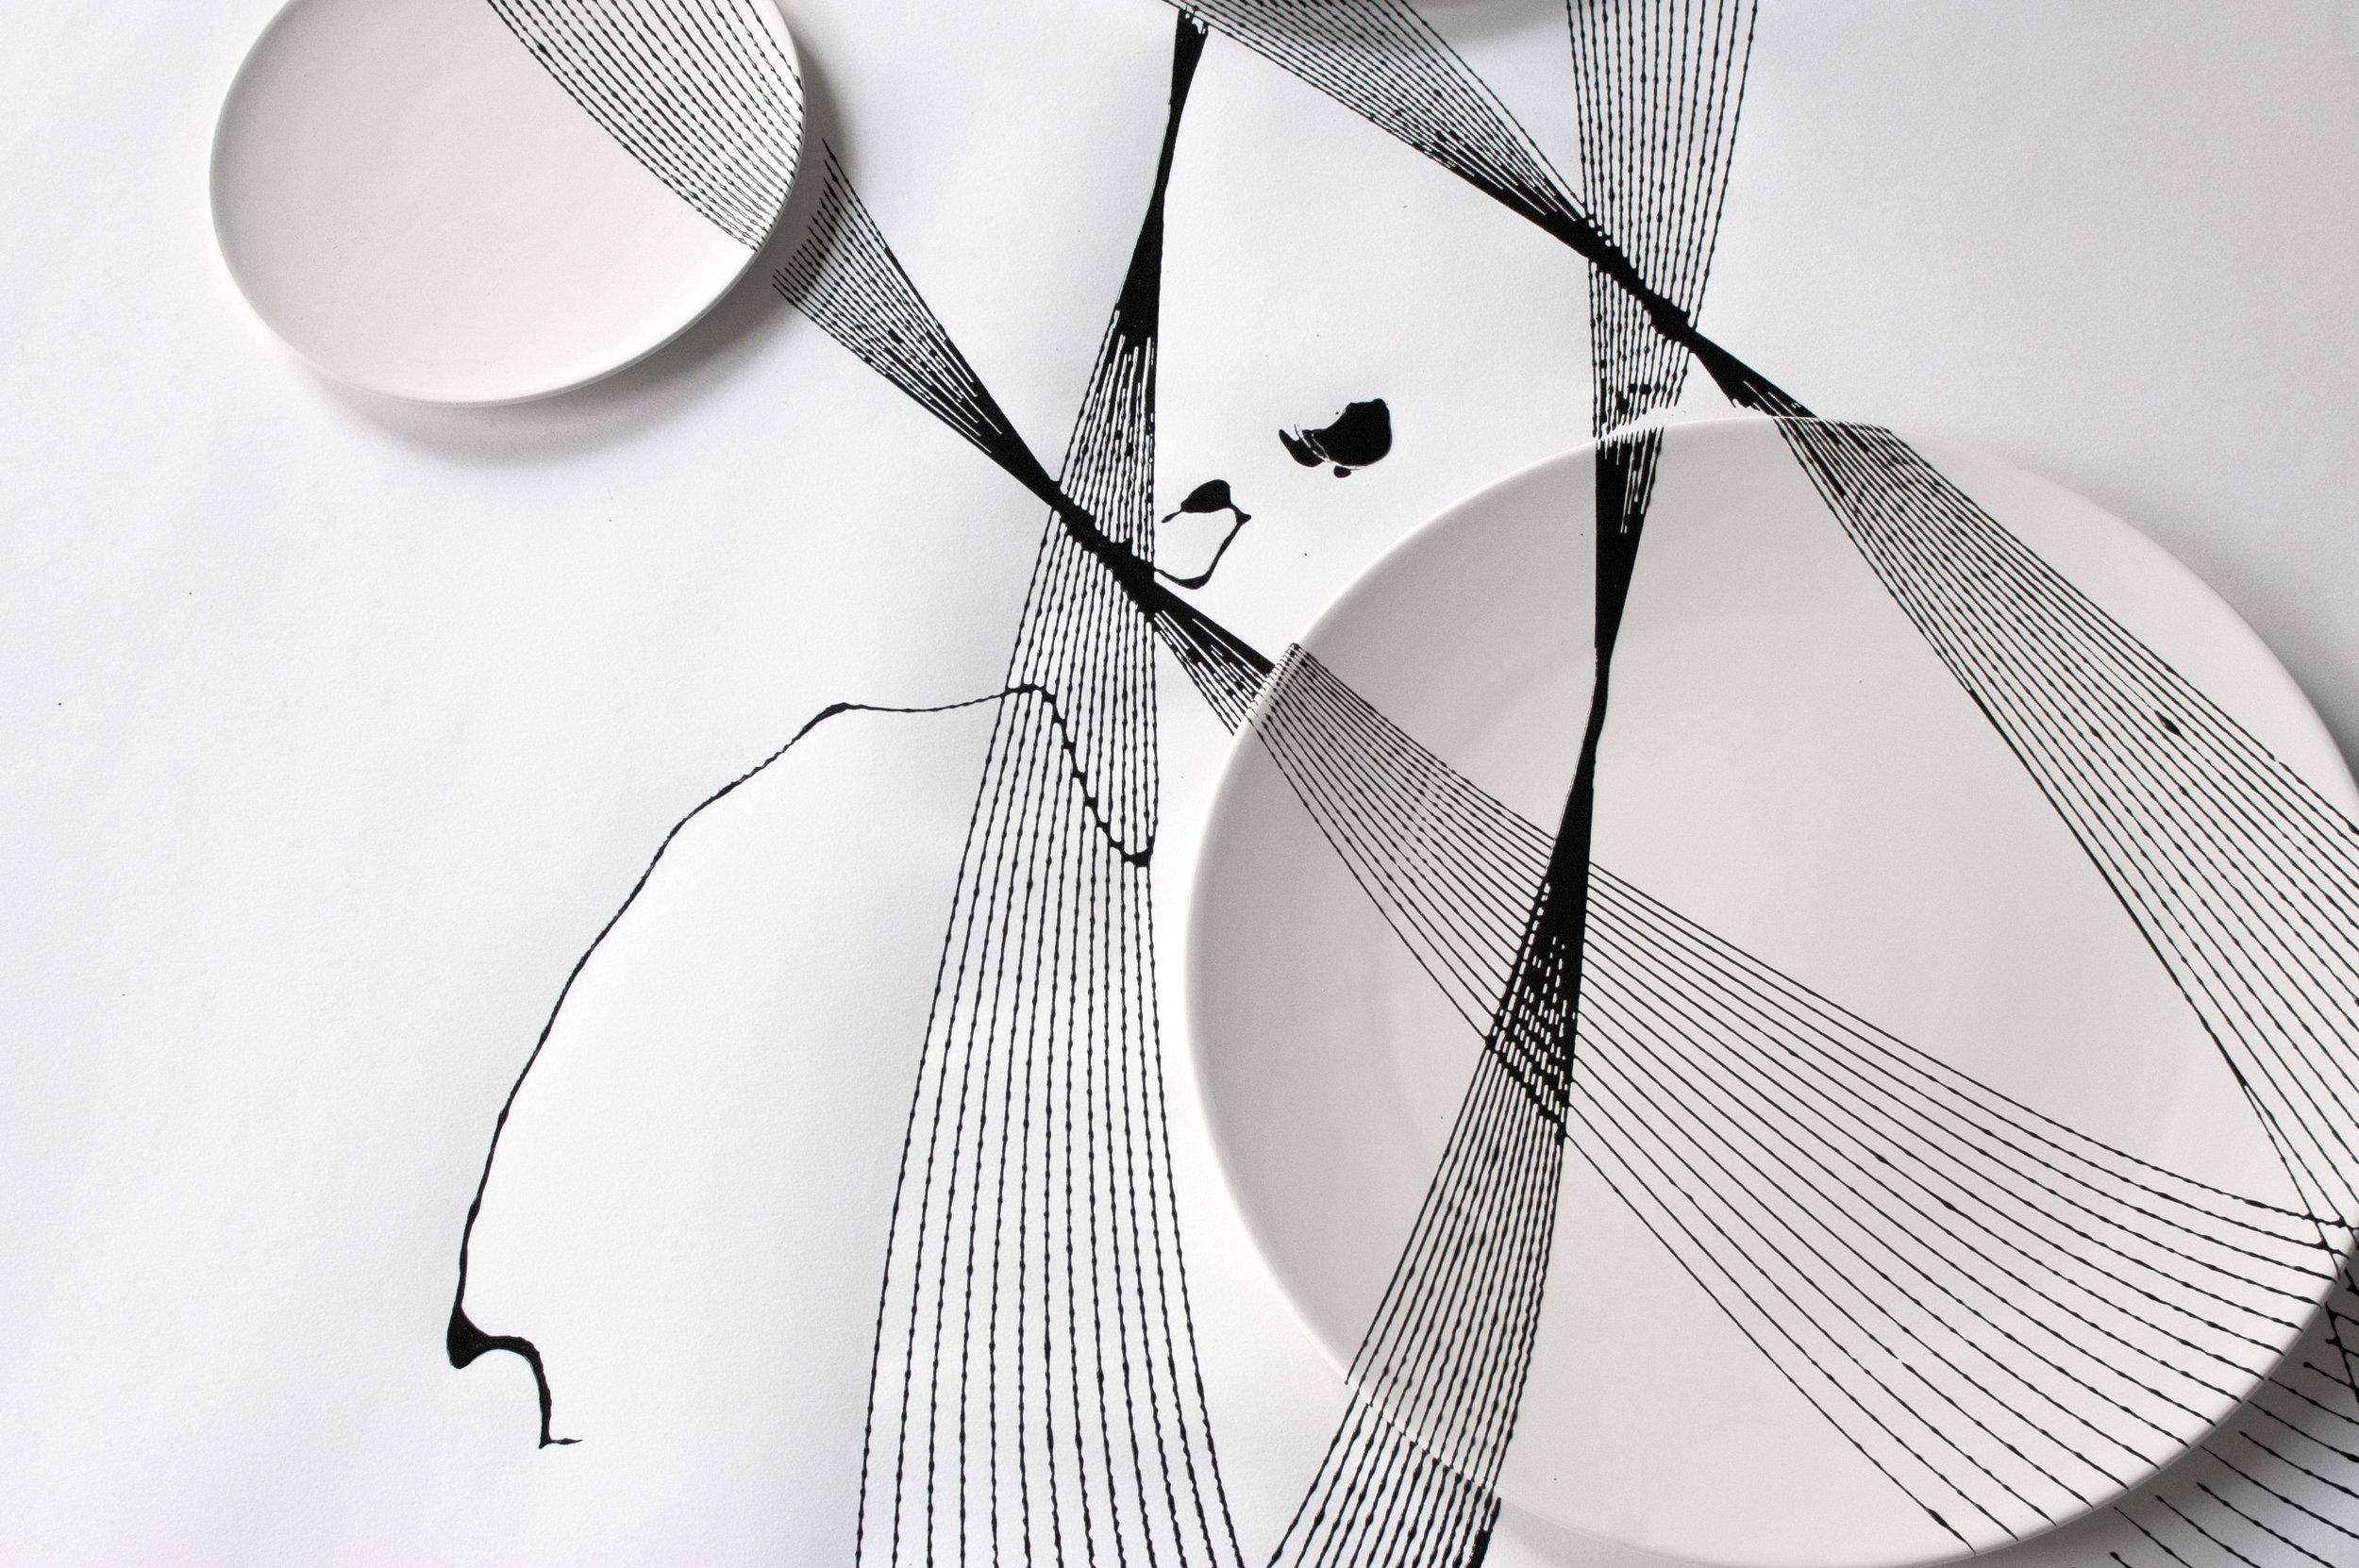 Oscillation plates-global view 02-David Derksen Design.jpg